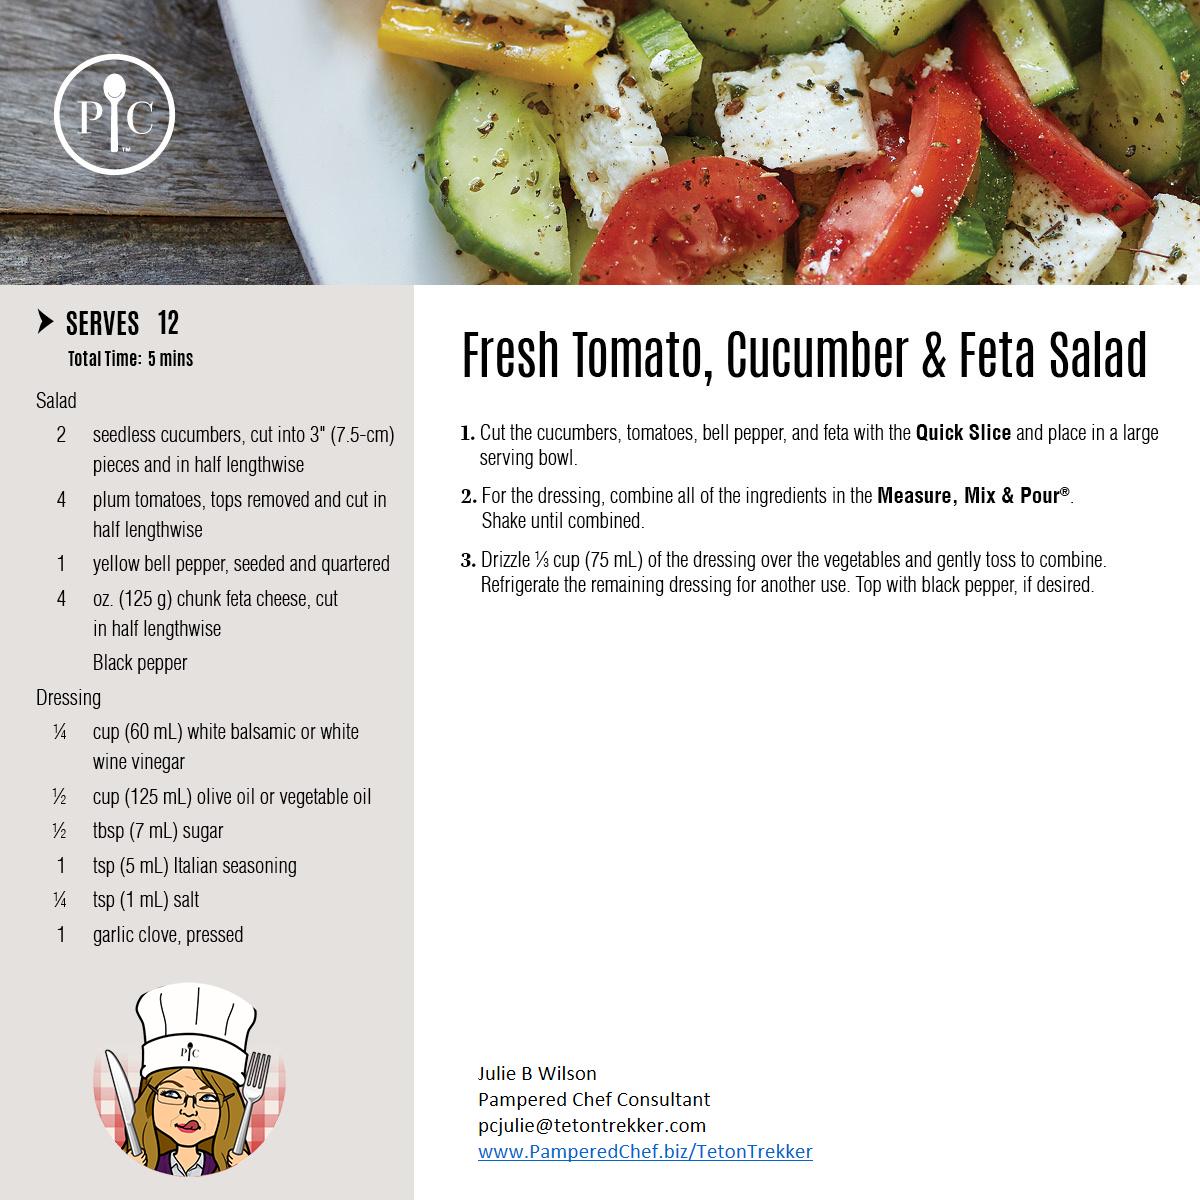 Fresh-Tomato-Cucumber-Feta-Salad